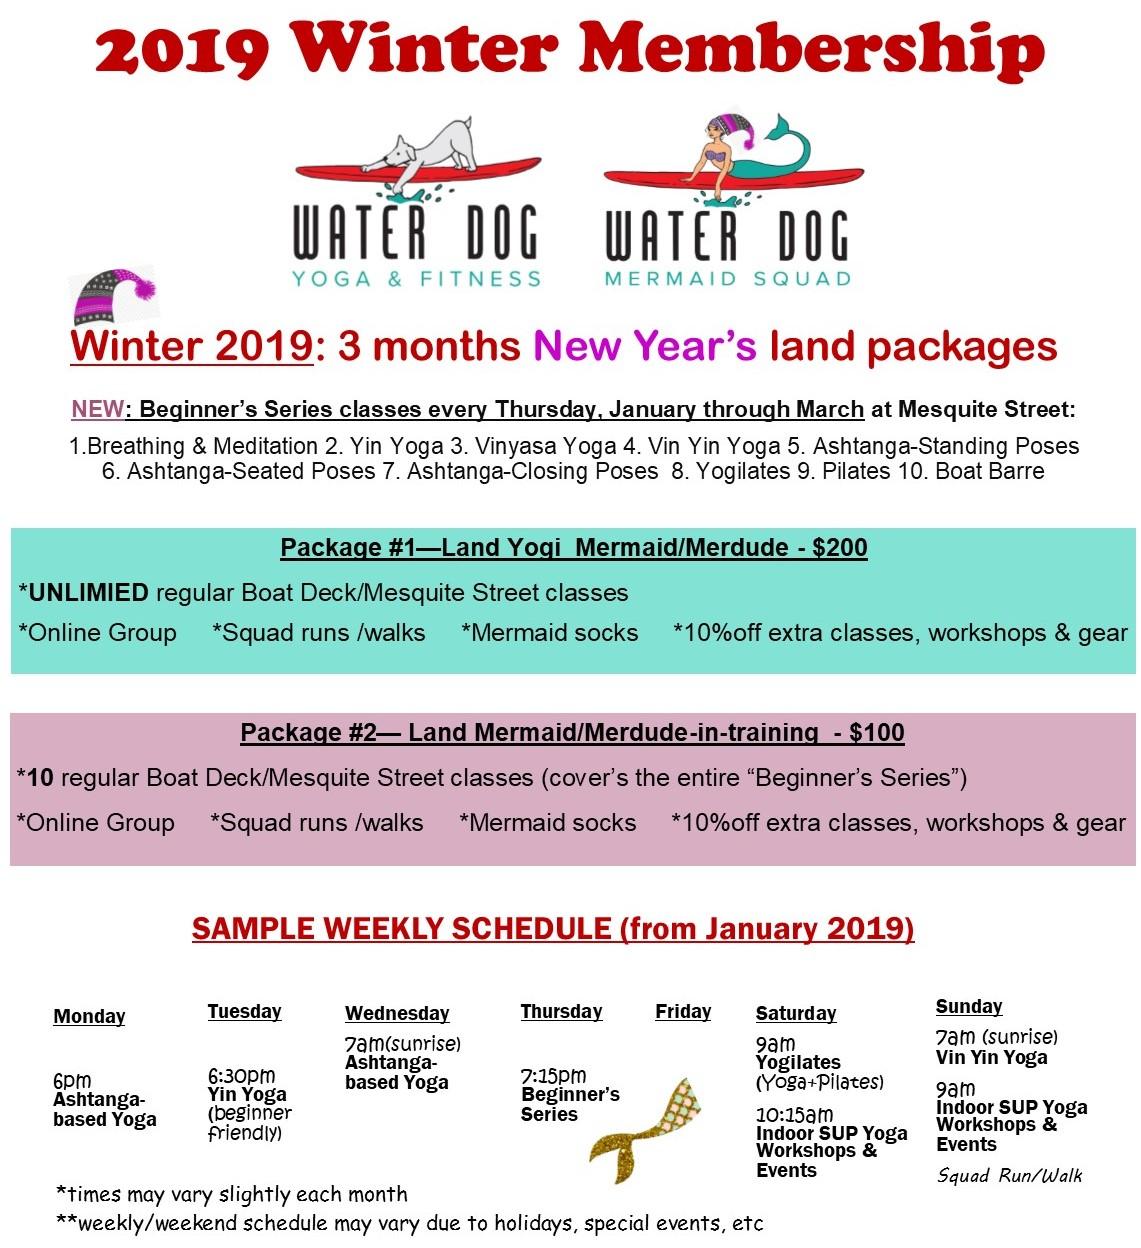 Water Dog Yoga membership programs for 2019